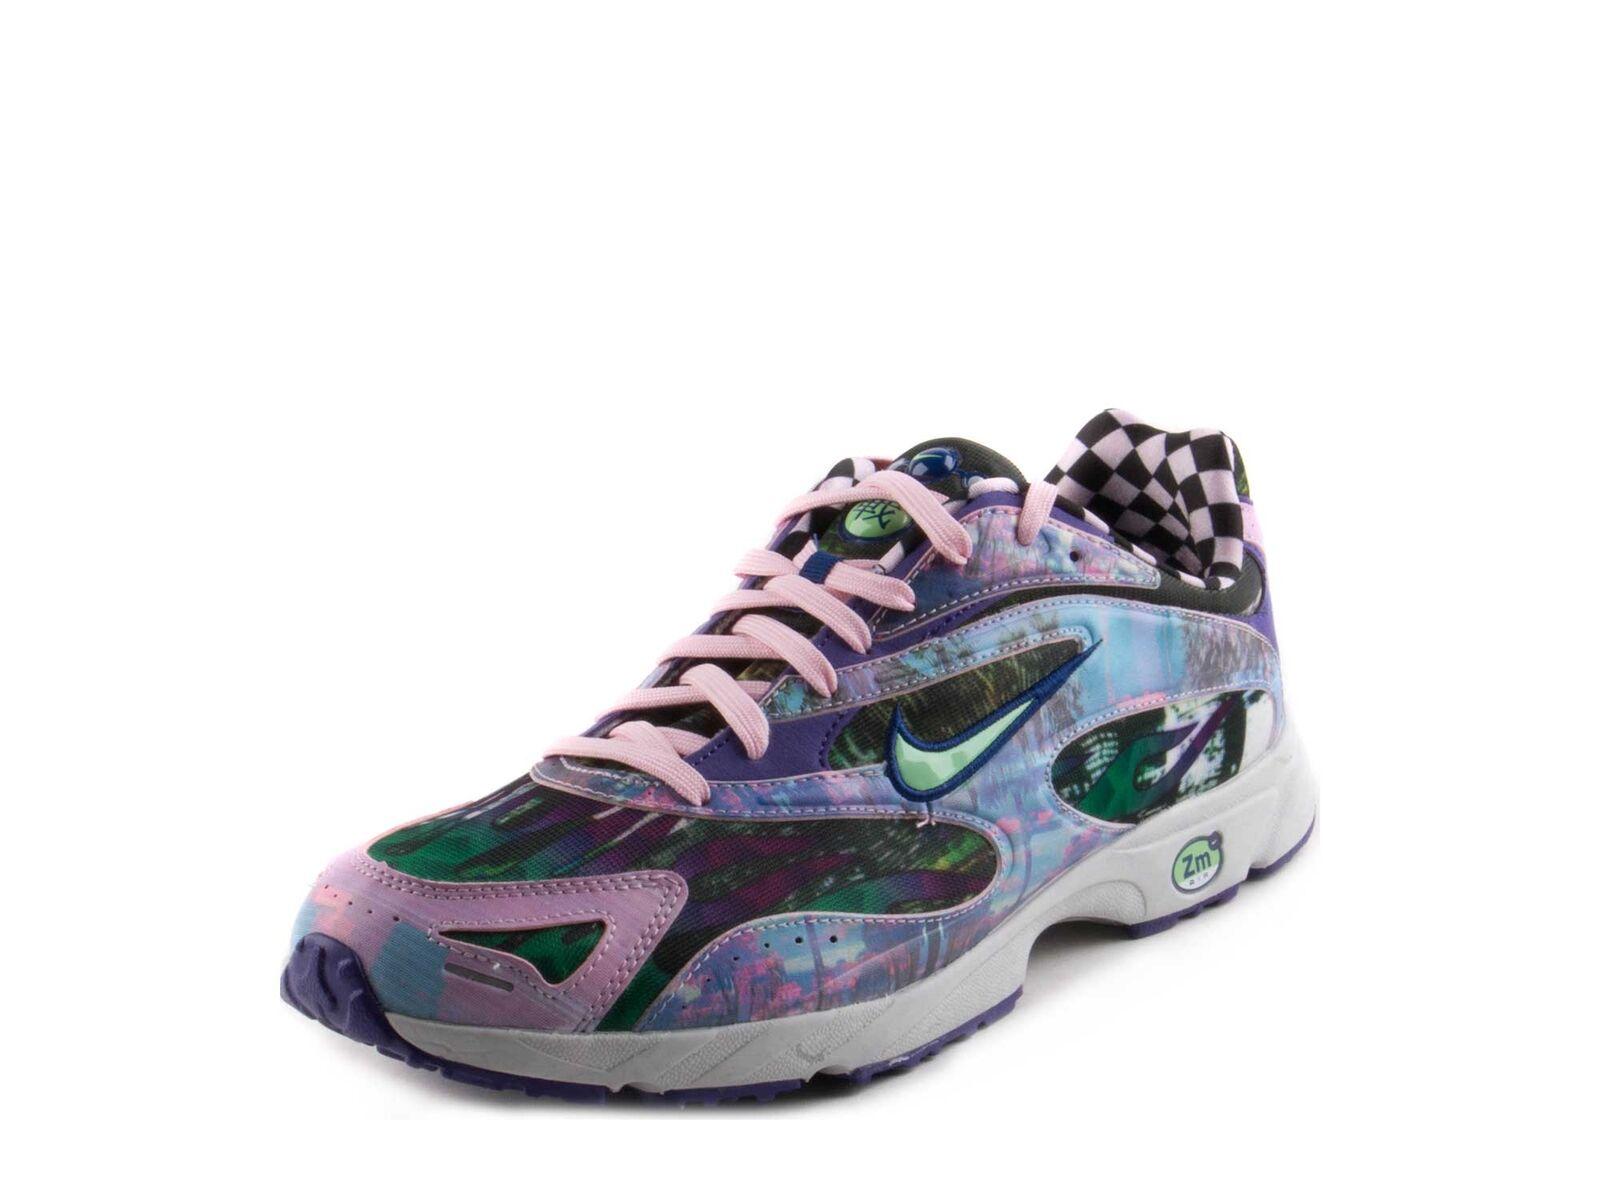 Nike homme ZM Streak Spectrum Poison Plus Prem Court  Violet /LT Poison Spectrum vert AR1533-500 344e31